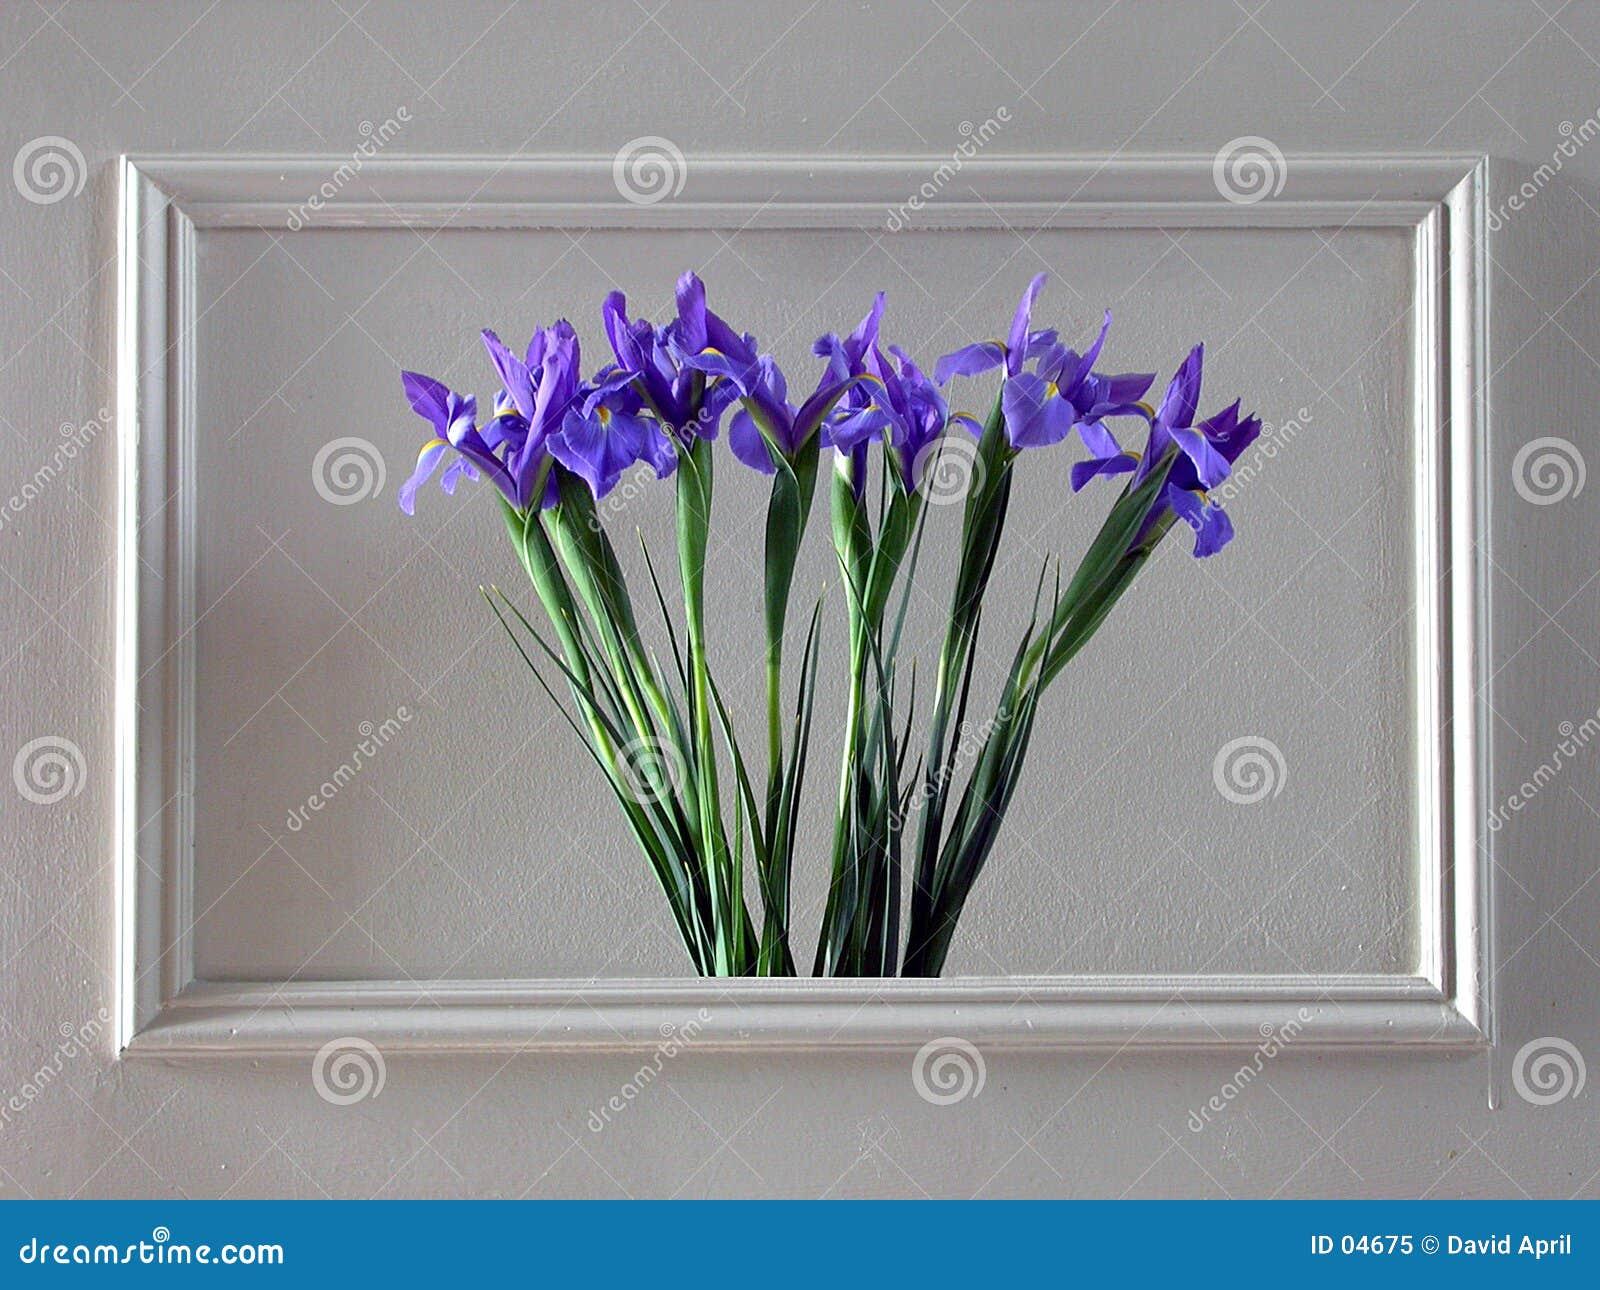 Wandblumen